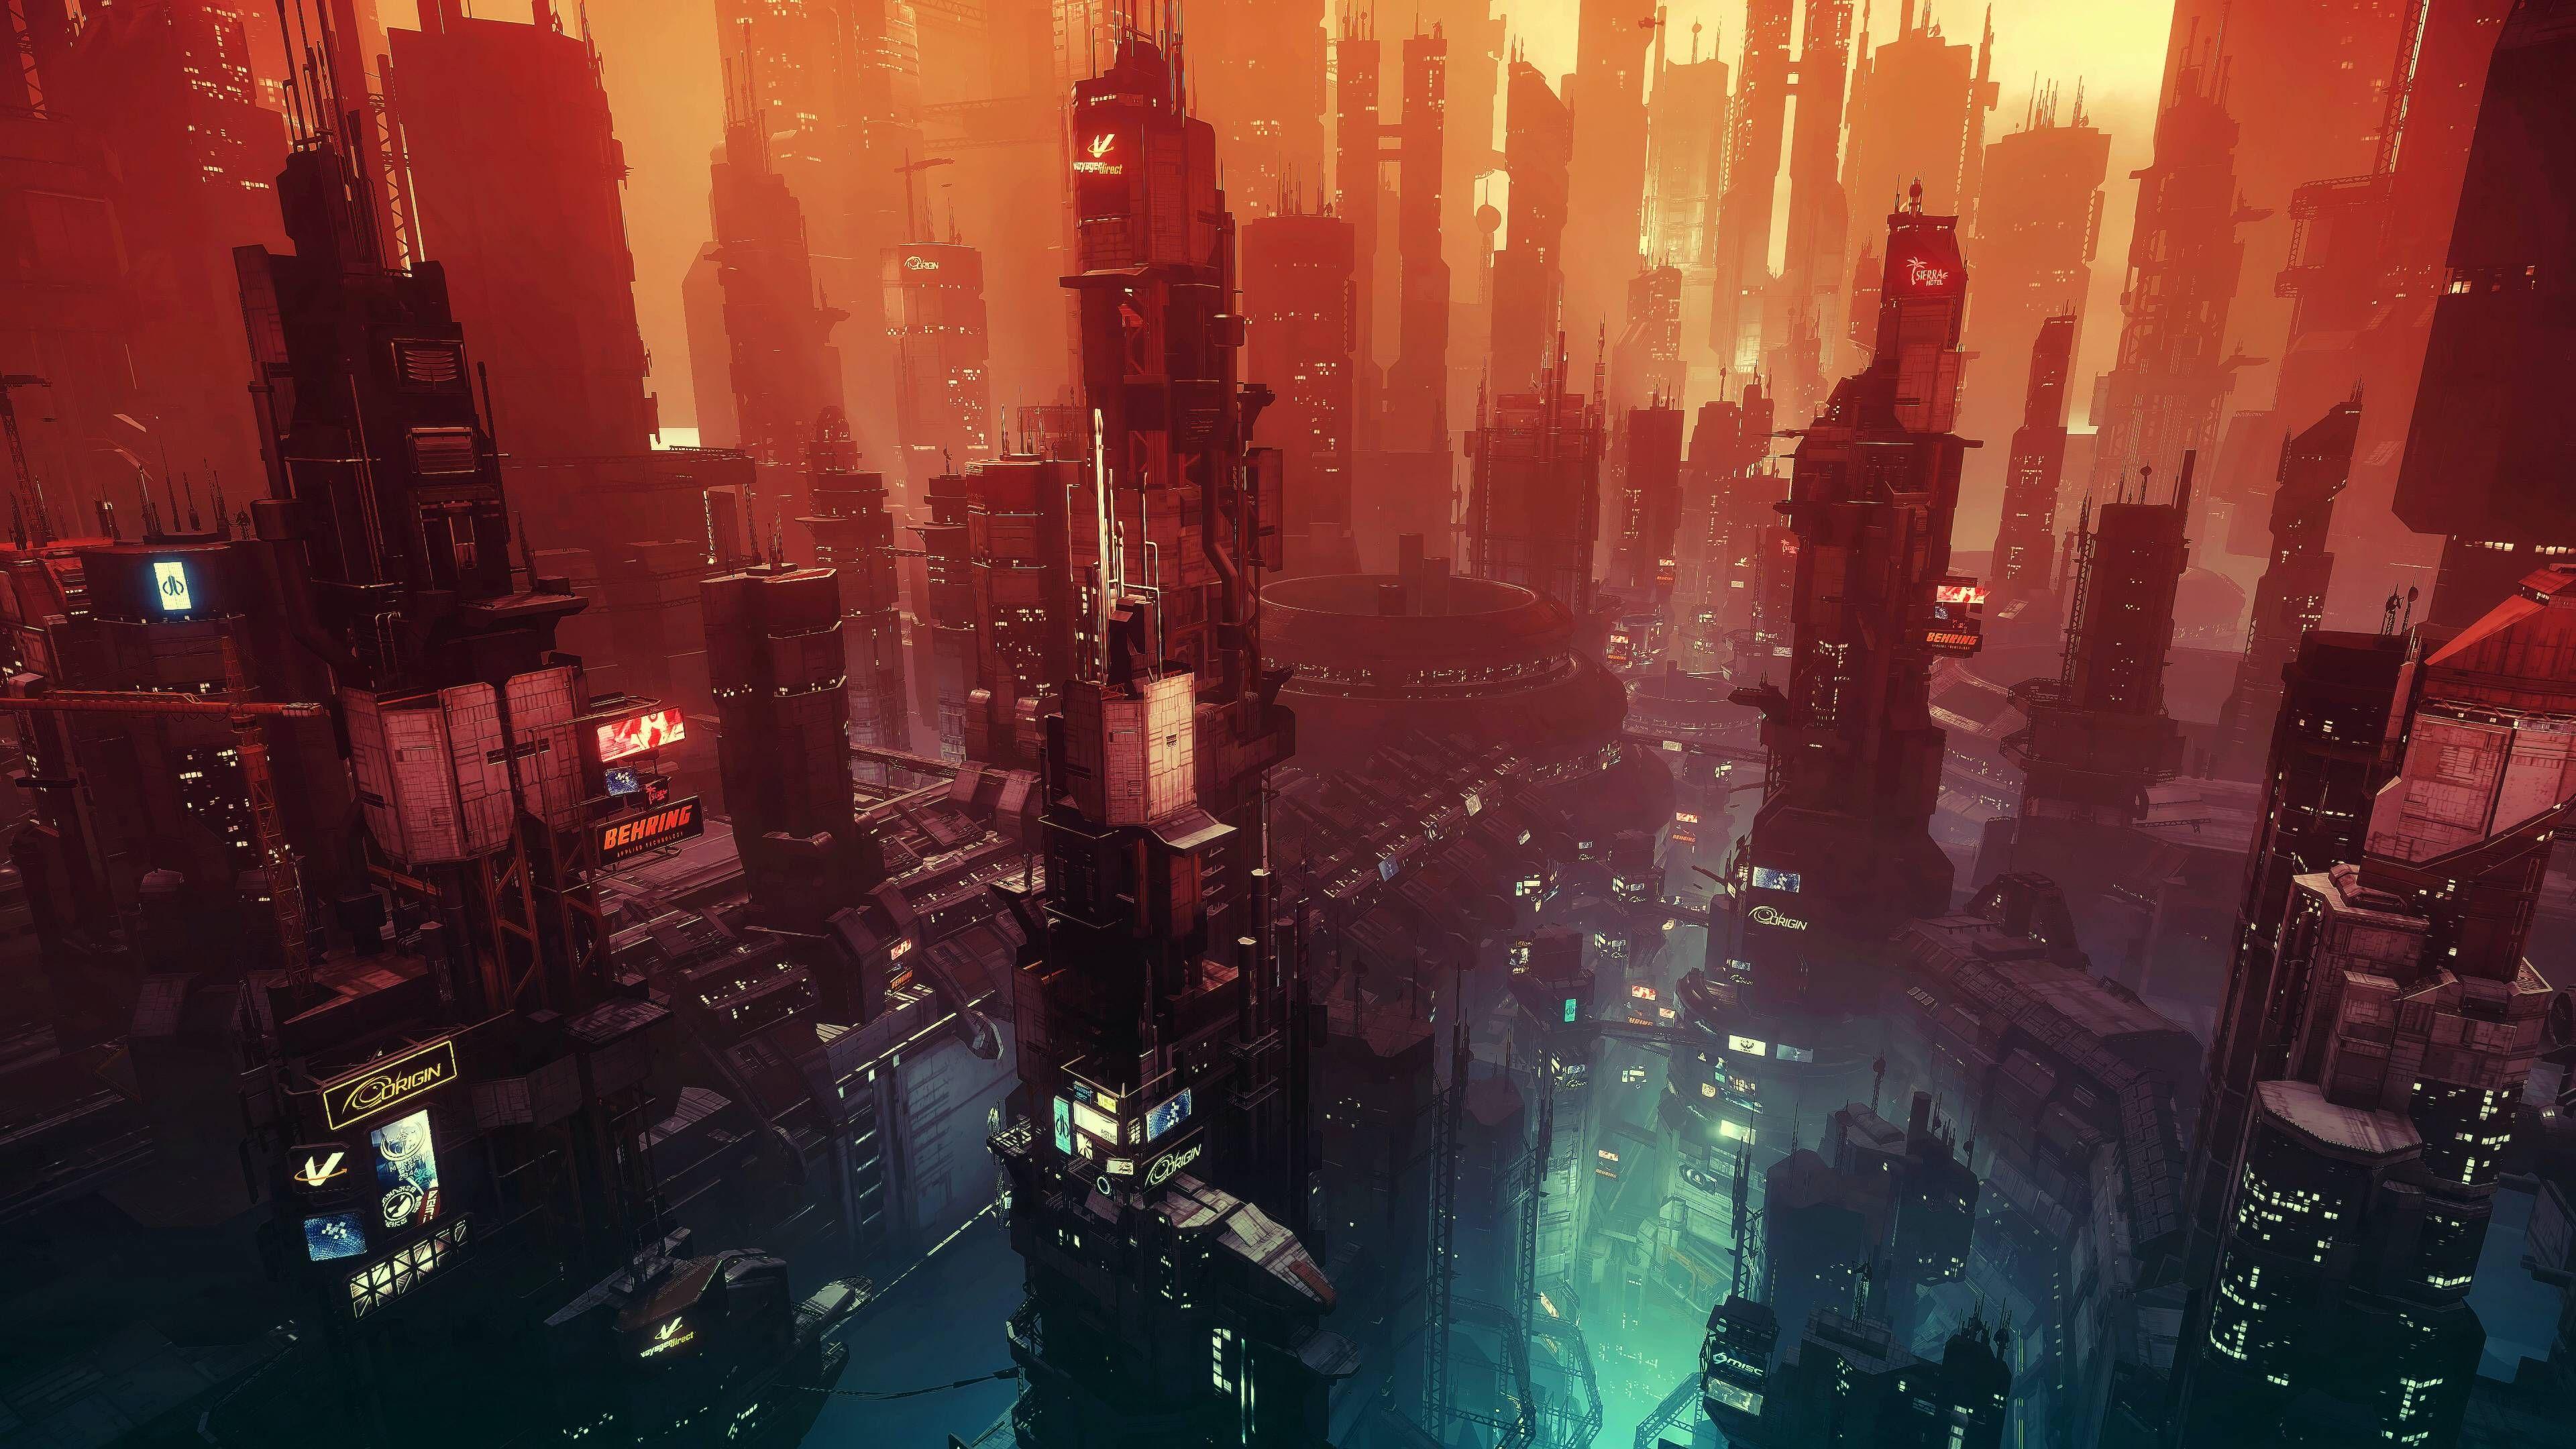 Cyberpunk Sunset [3840×2160] 4K